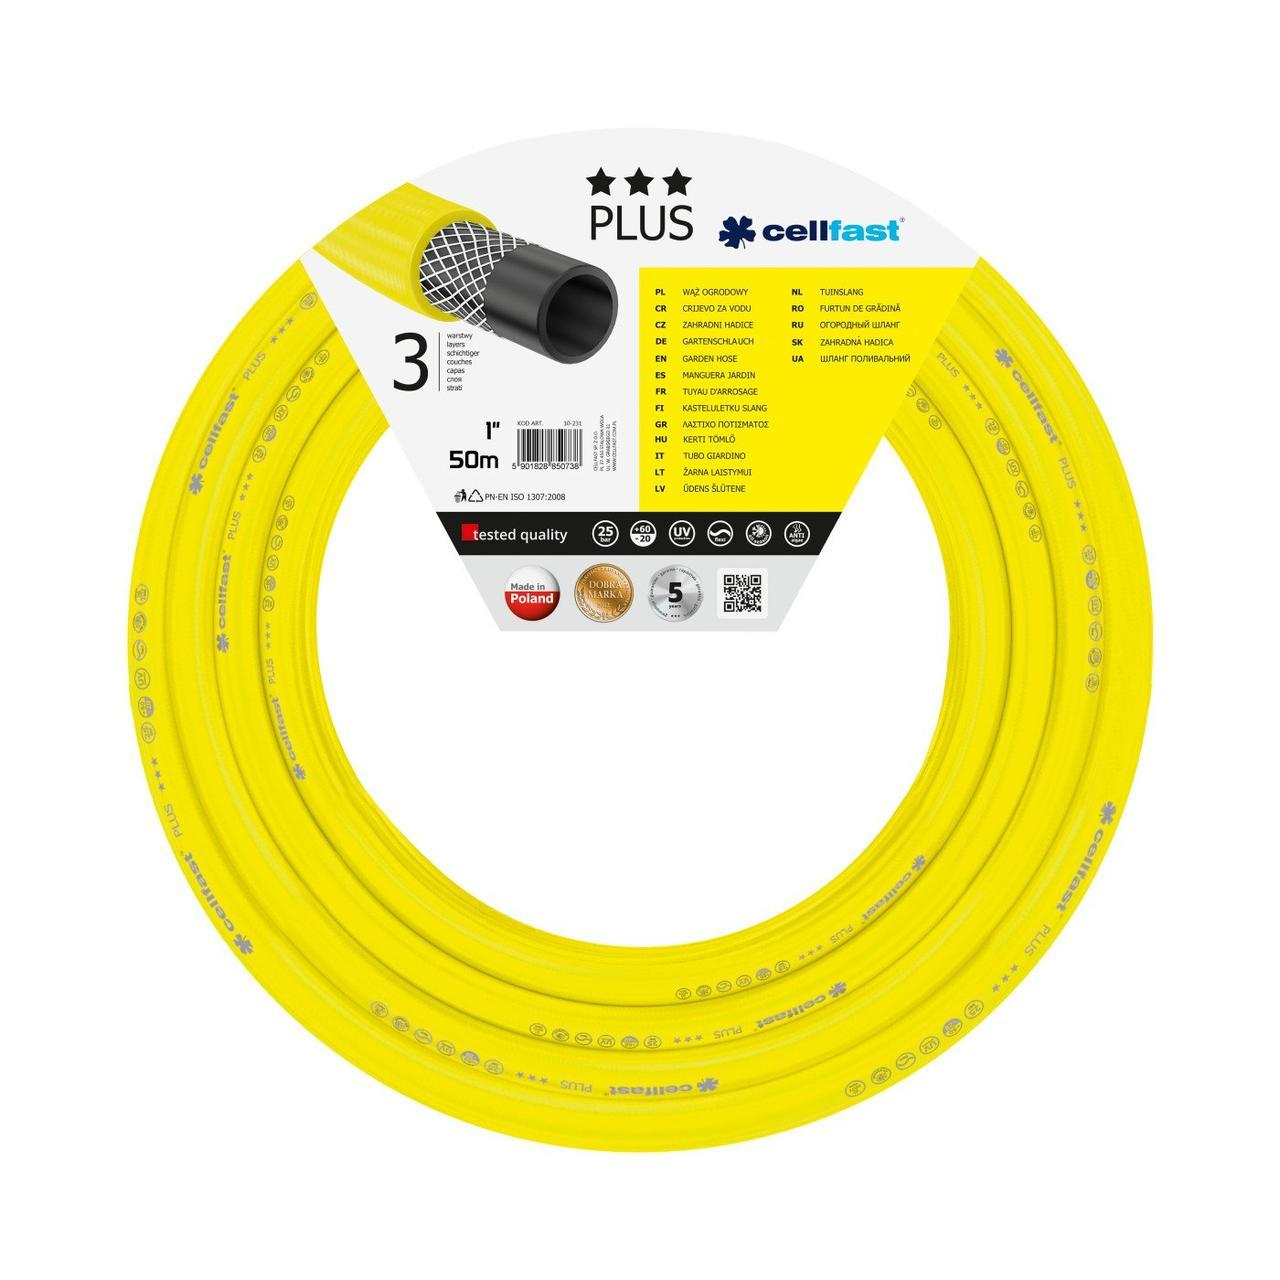 Шланг для полива Cellfast ECO PLUS жолтый 3/4     (бухта 30м.), цена за бухту